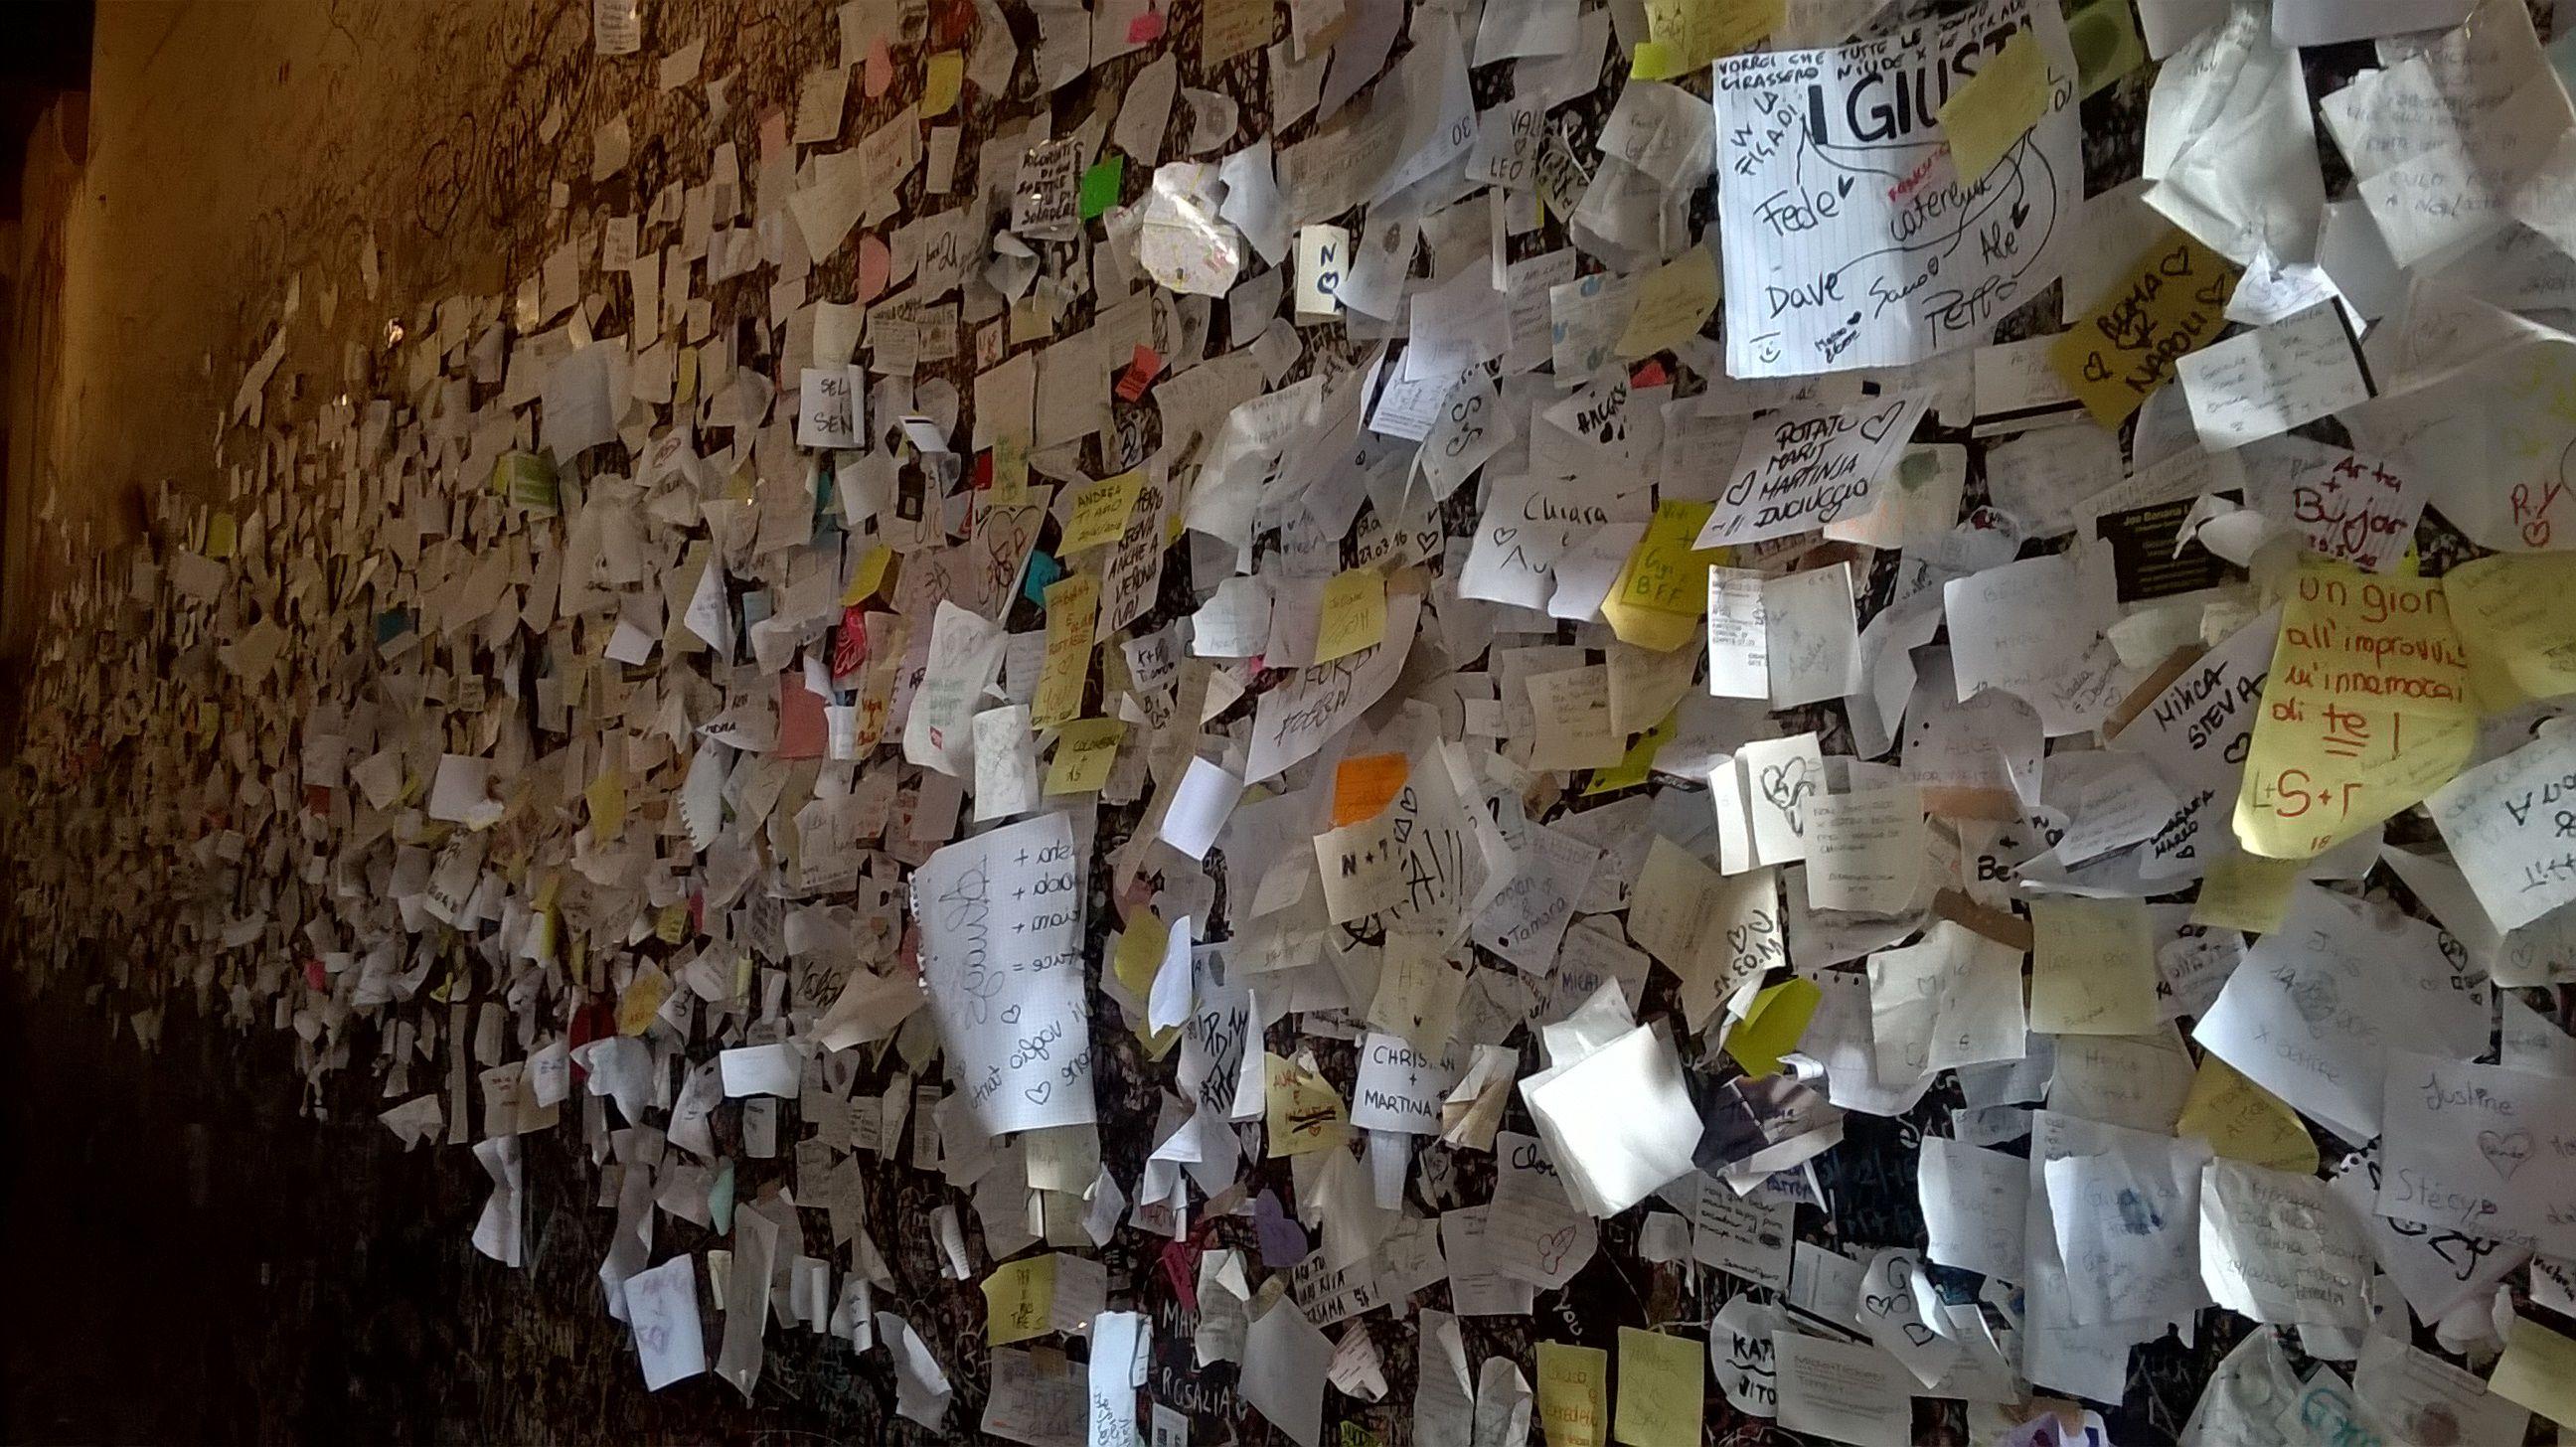 Verona #romeoegiulietta #love #casadigiulietta #storia #cultura #travel #innamorati